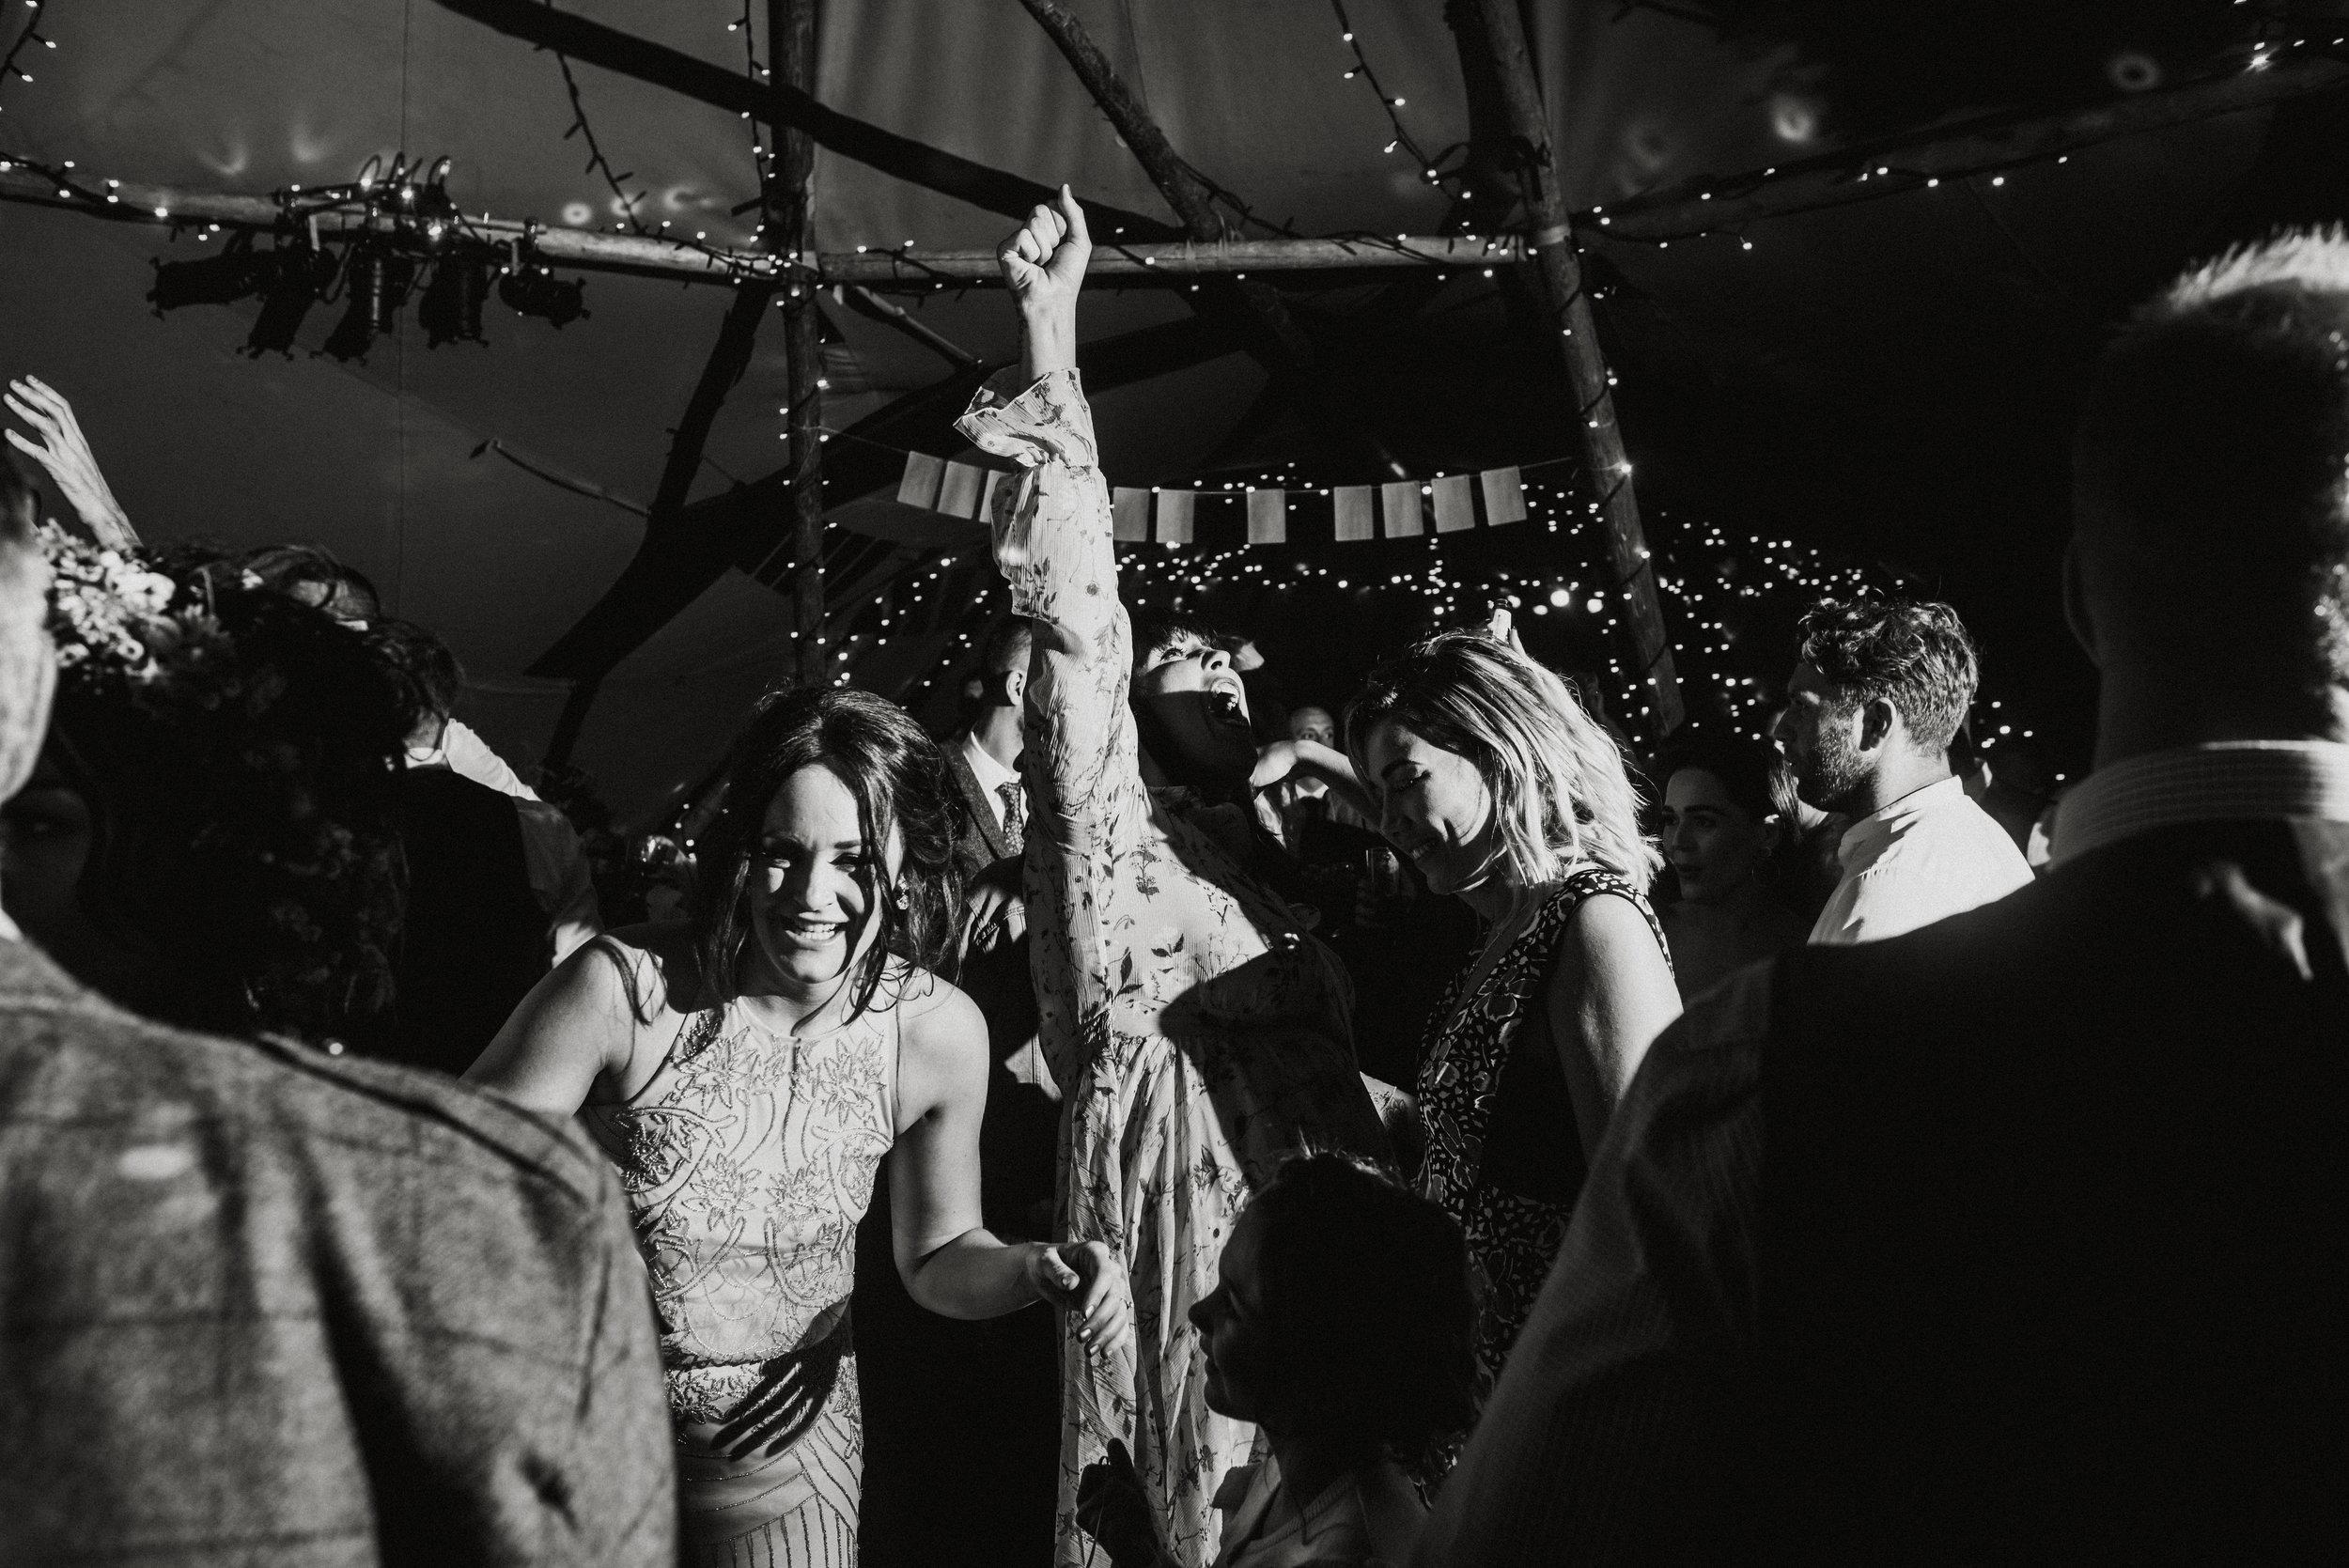 pengenna-manor-wedding-photographer-88.jpg